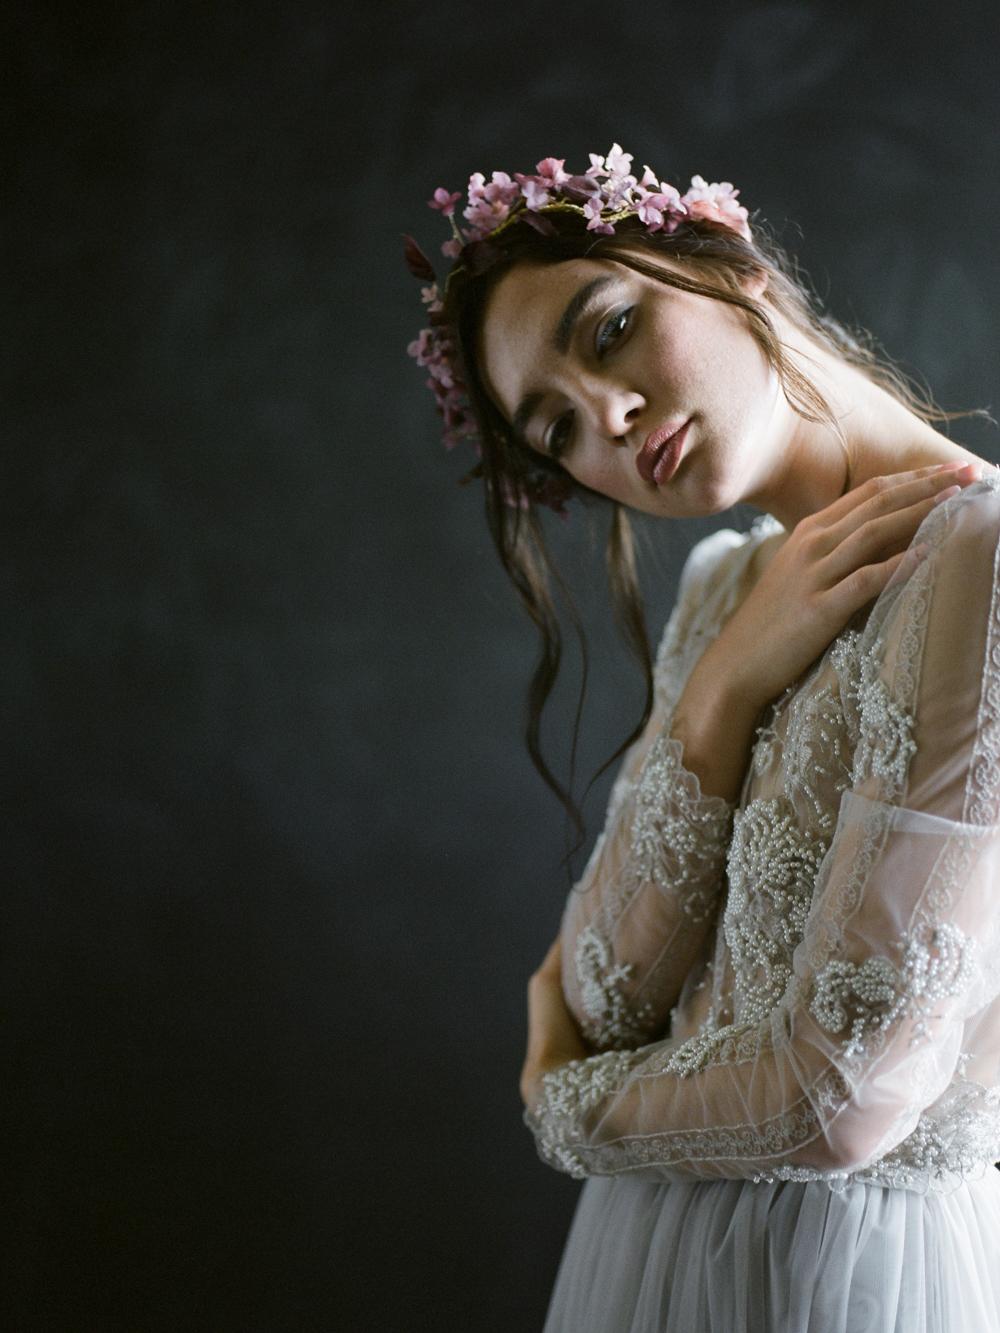 Christine Gosch - Erin Rhyne - film photographer - brand photographer - portrait photographer-6.jpg